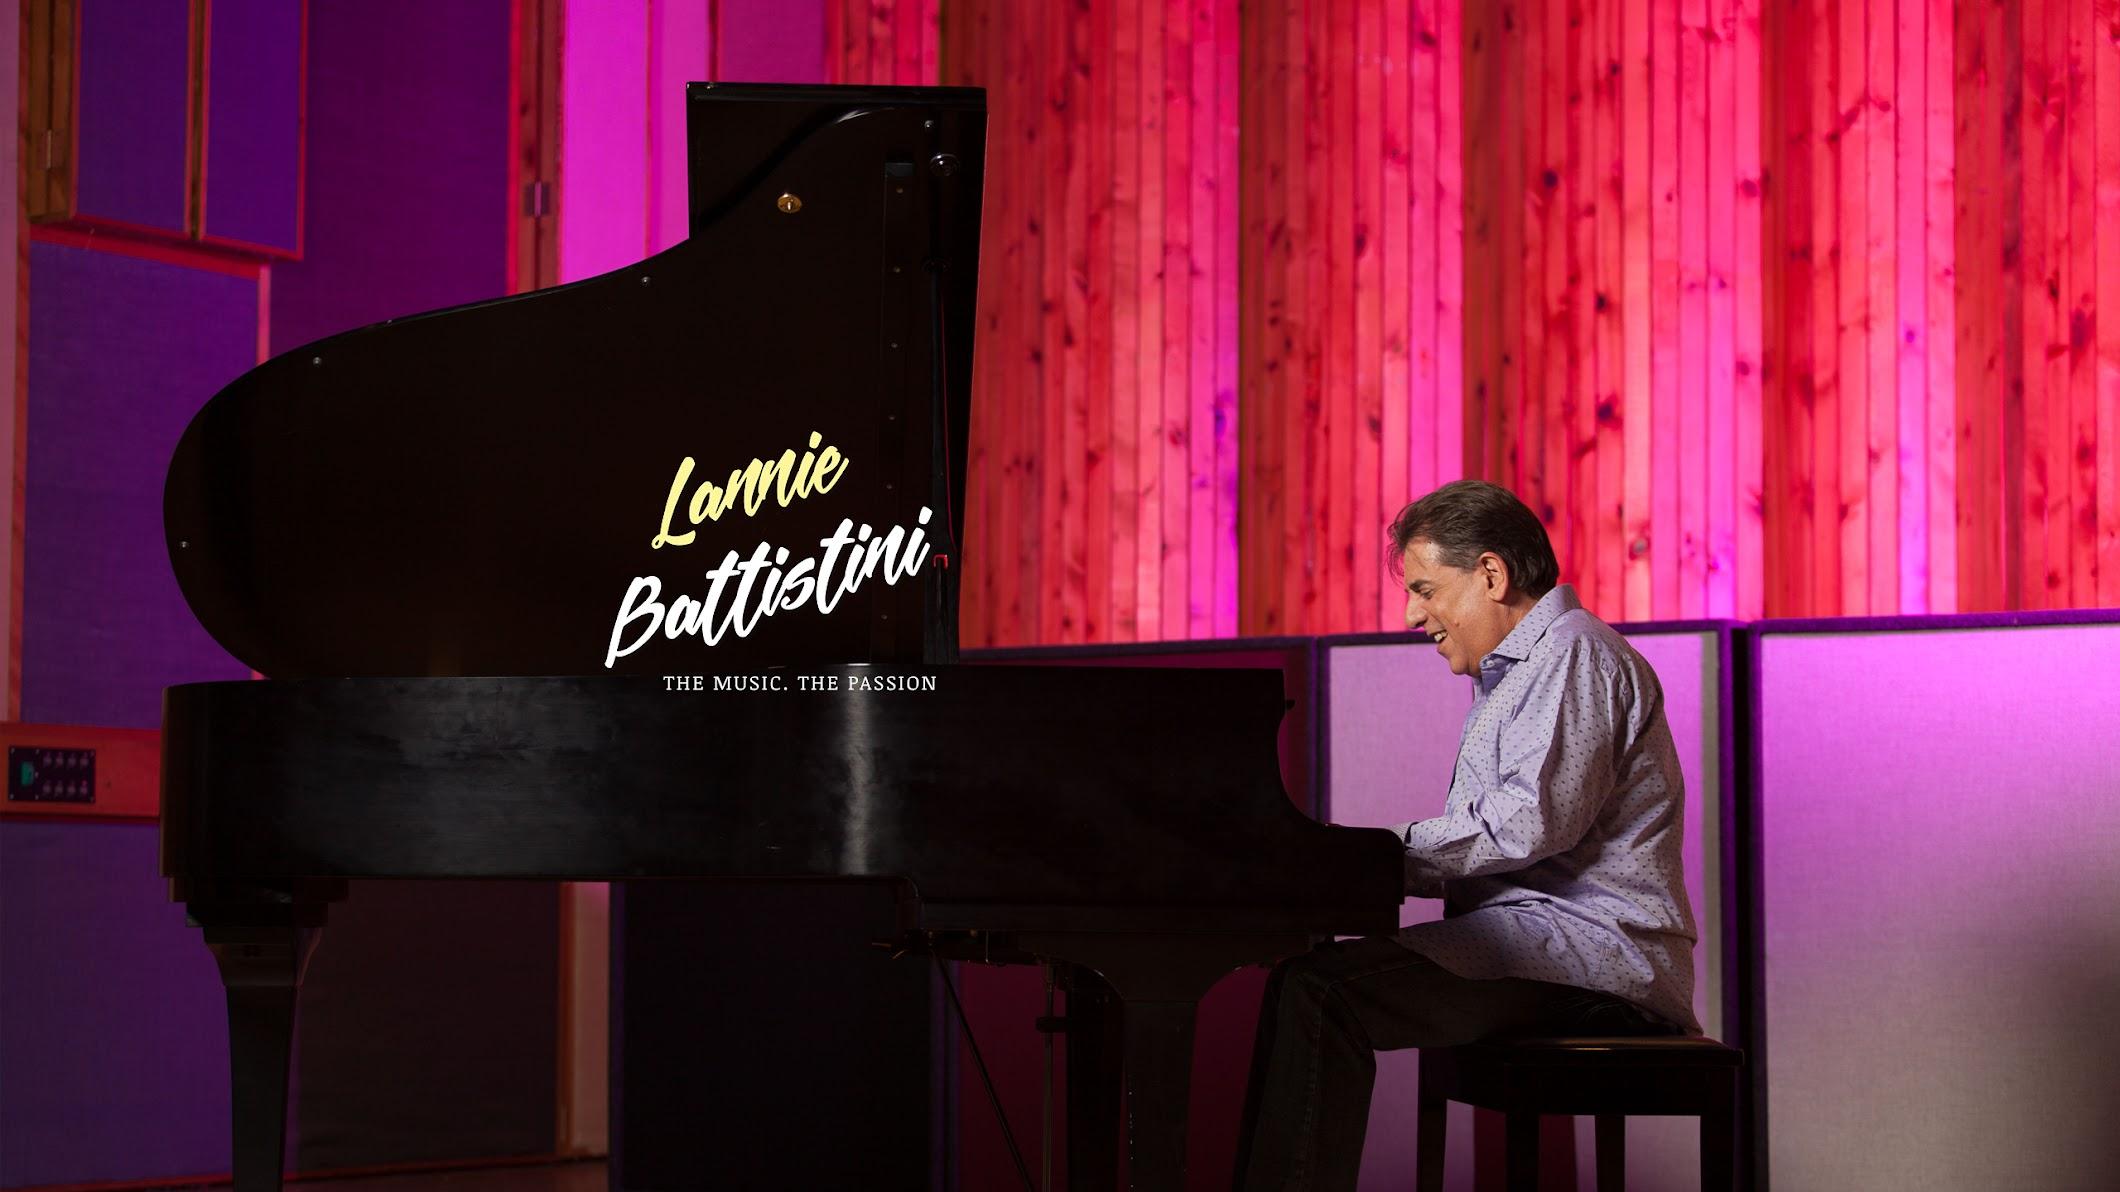 Lannie Battistini